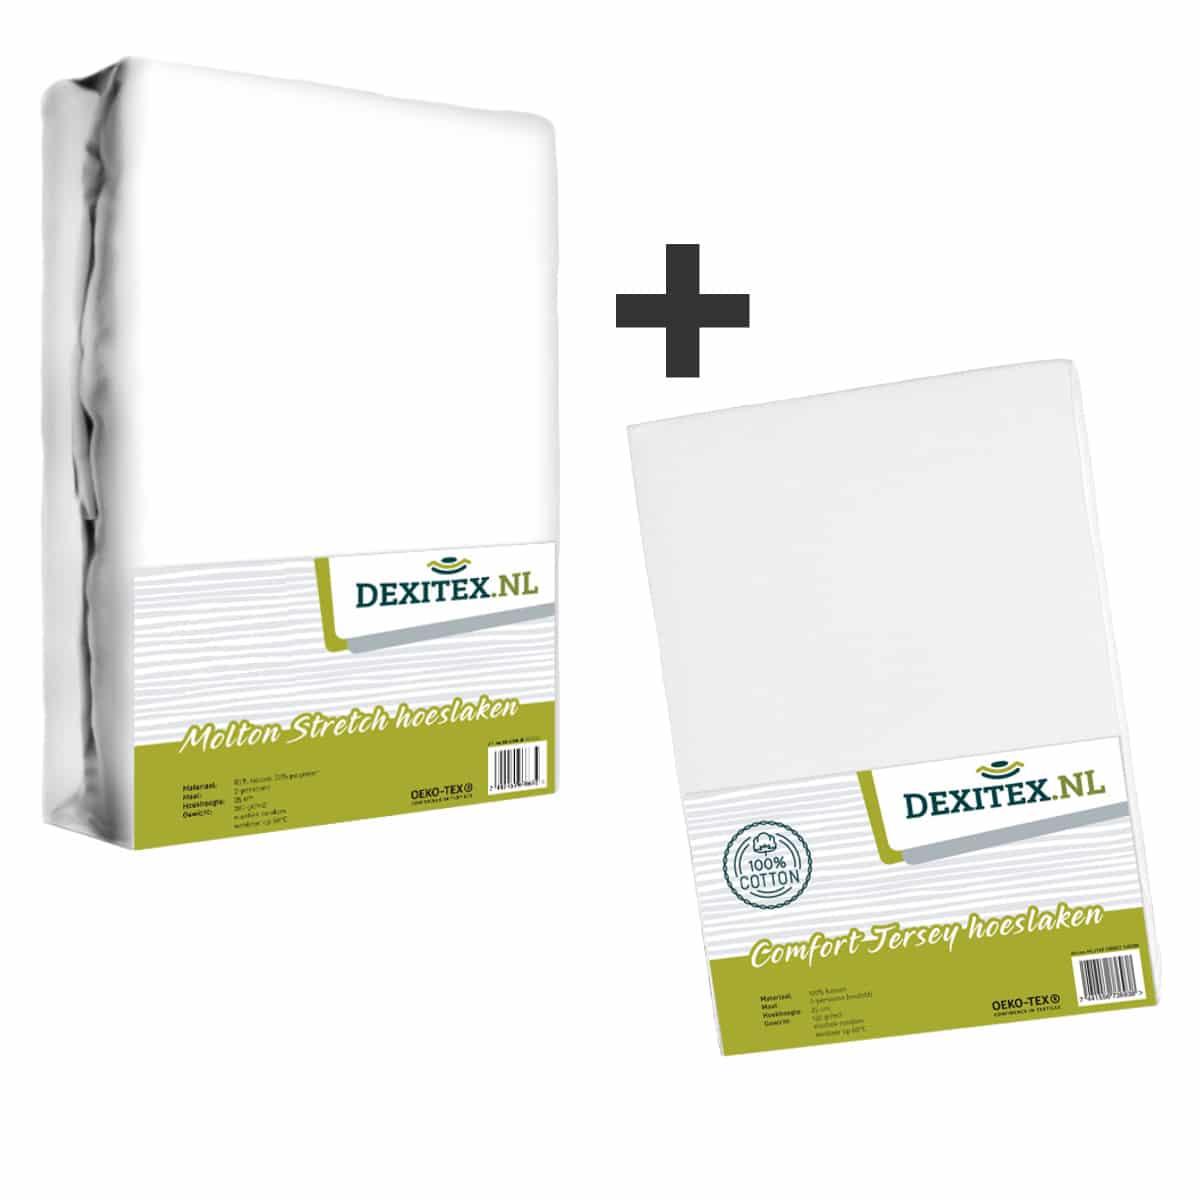 Textiel pakket - 1x Molton wit + 1x jersey hoeslaken wit